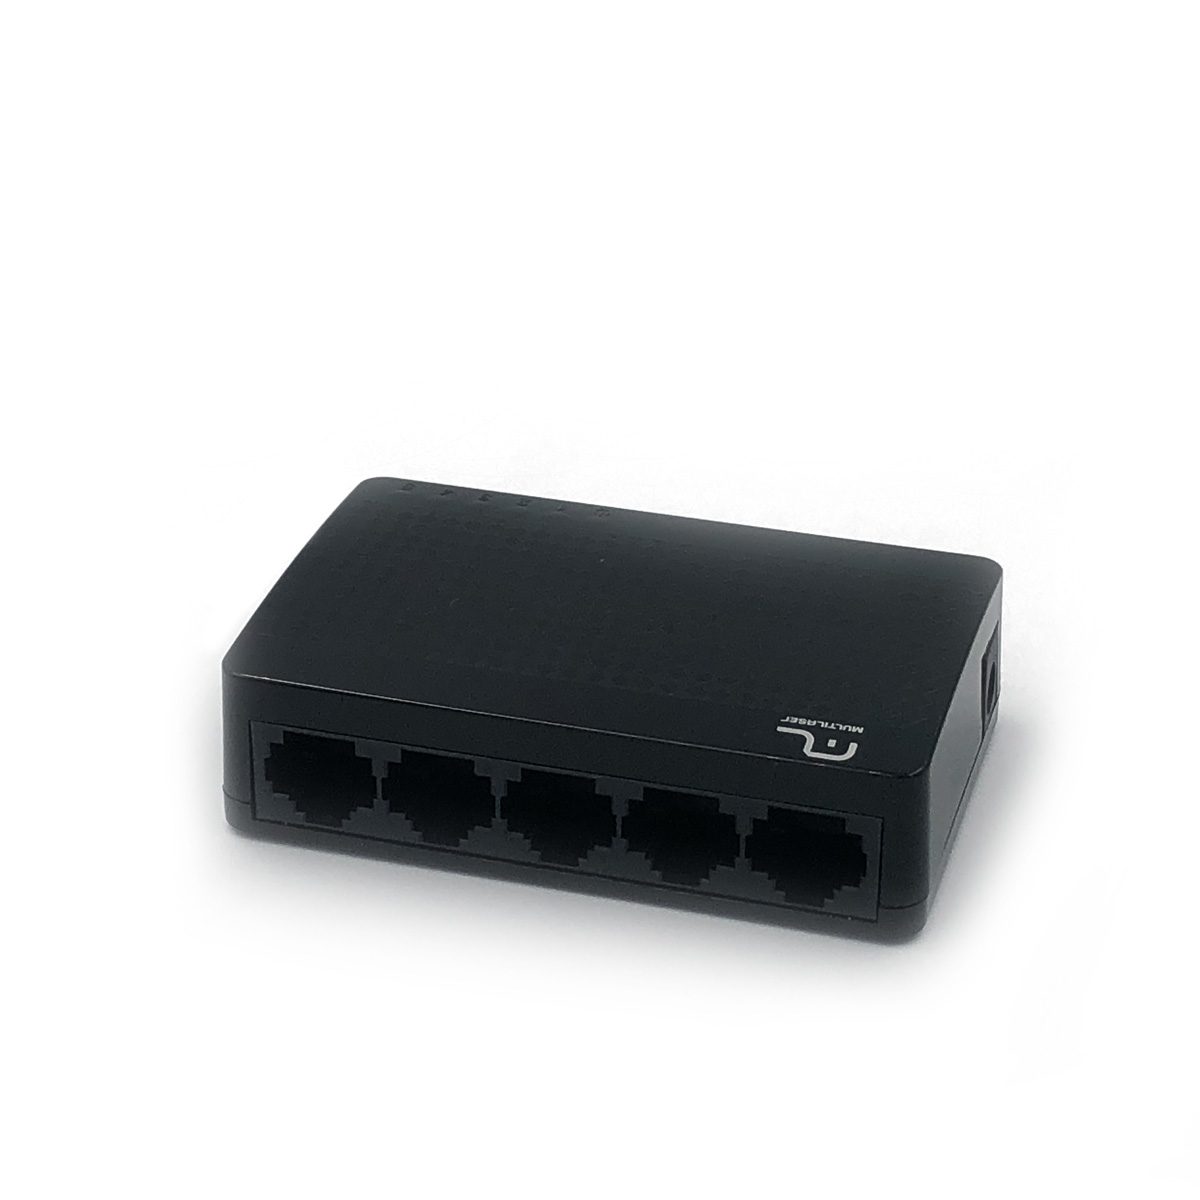 Switch de Mesa com 5 Portas Ethernet 10/100Mbps RE305 Multilaser